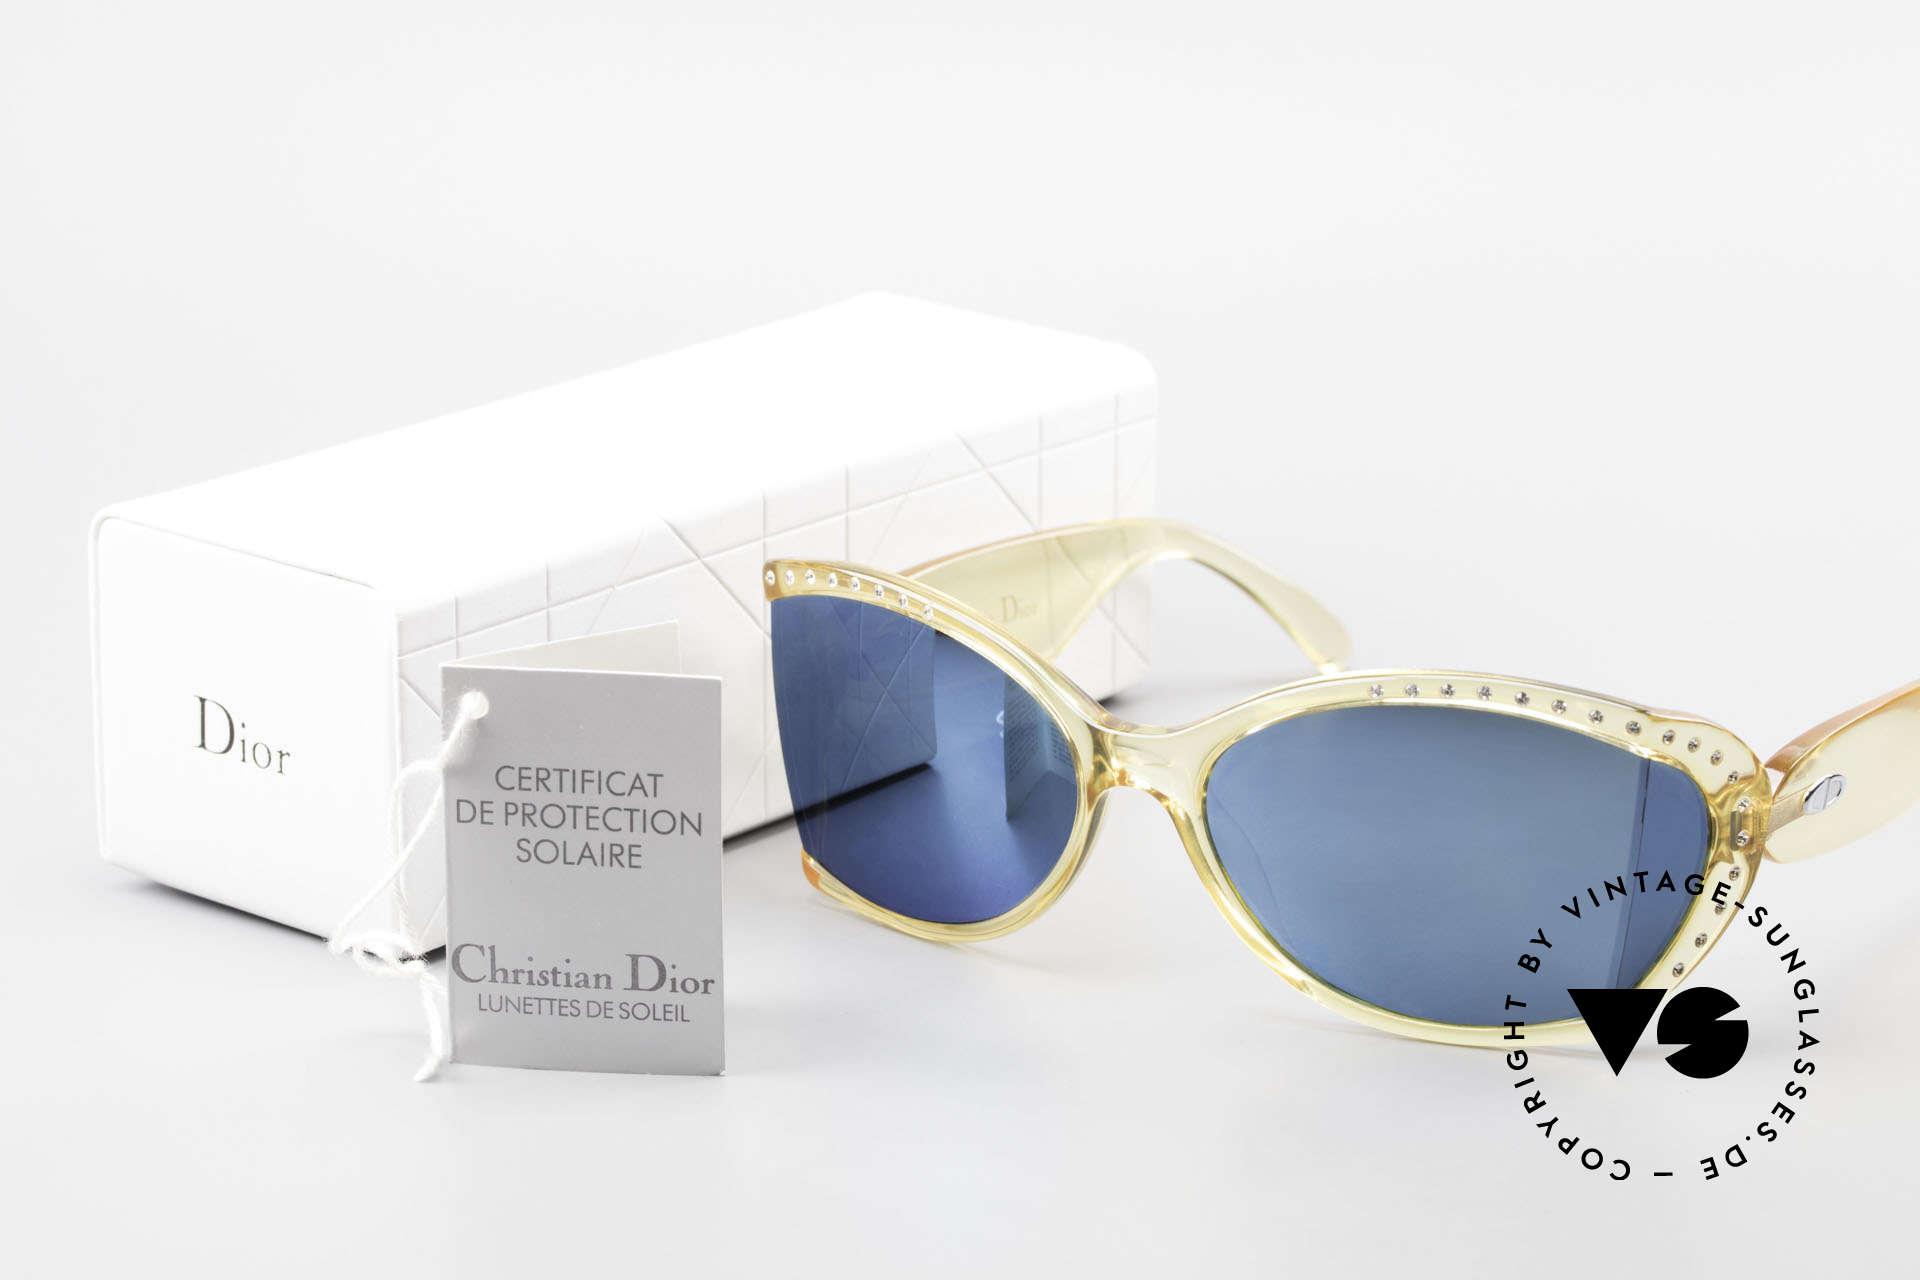 Christian Dior 2439 80's Crystal Sunglasses Gem, Size: medium, Made for Women